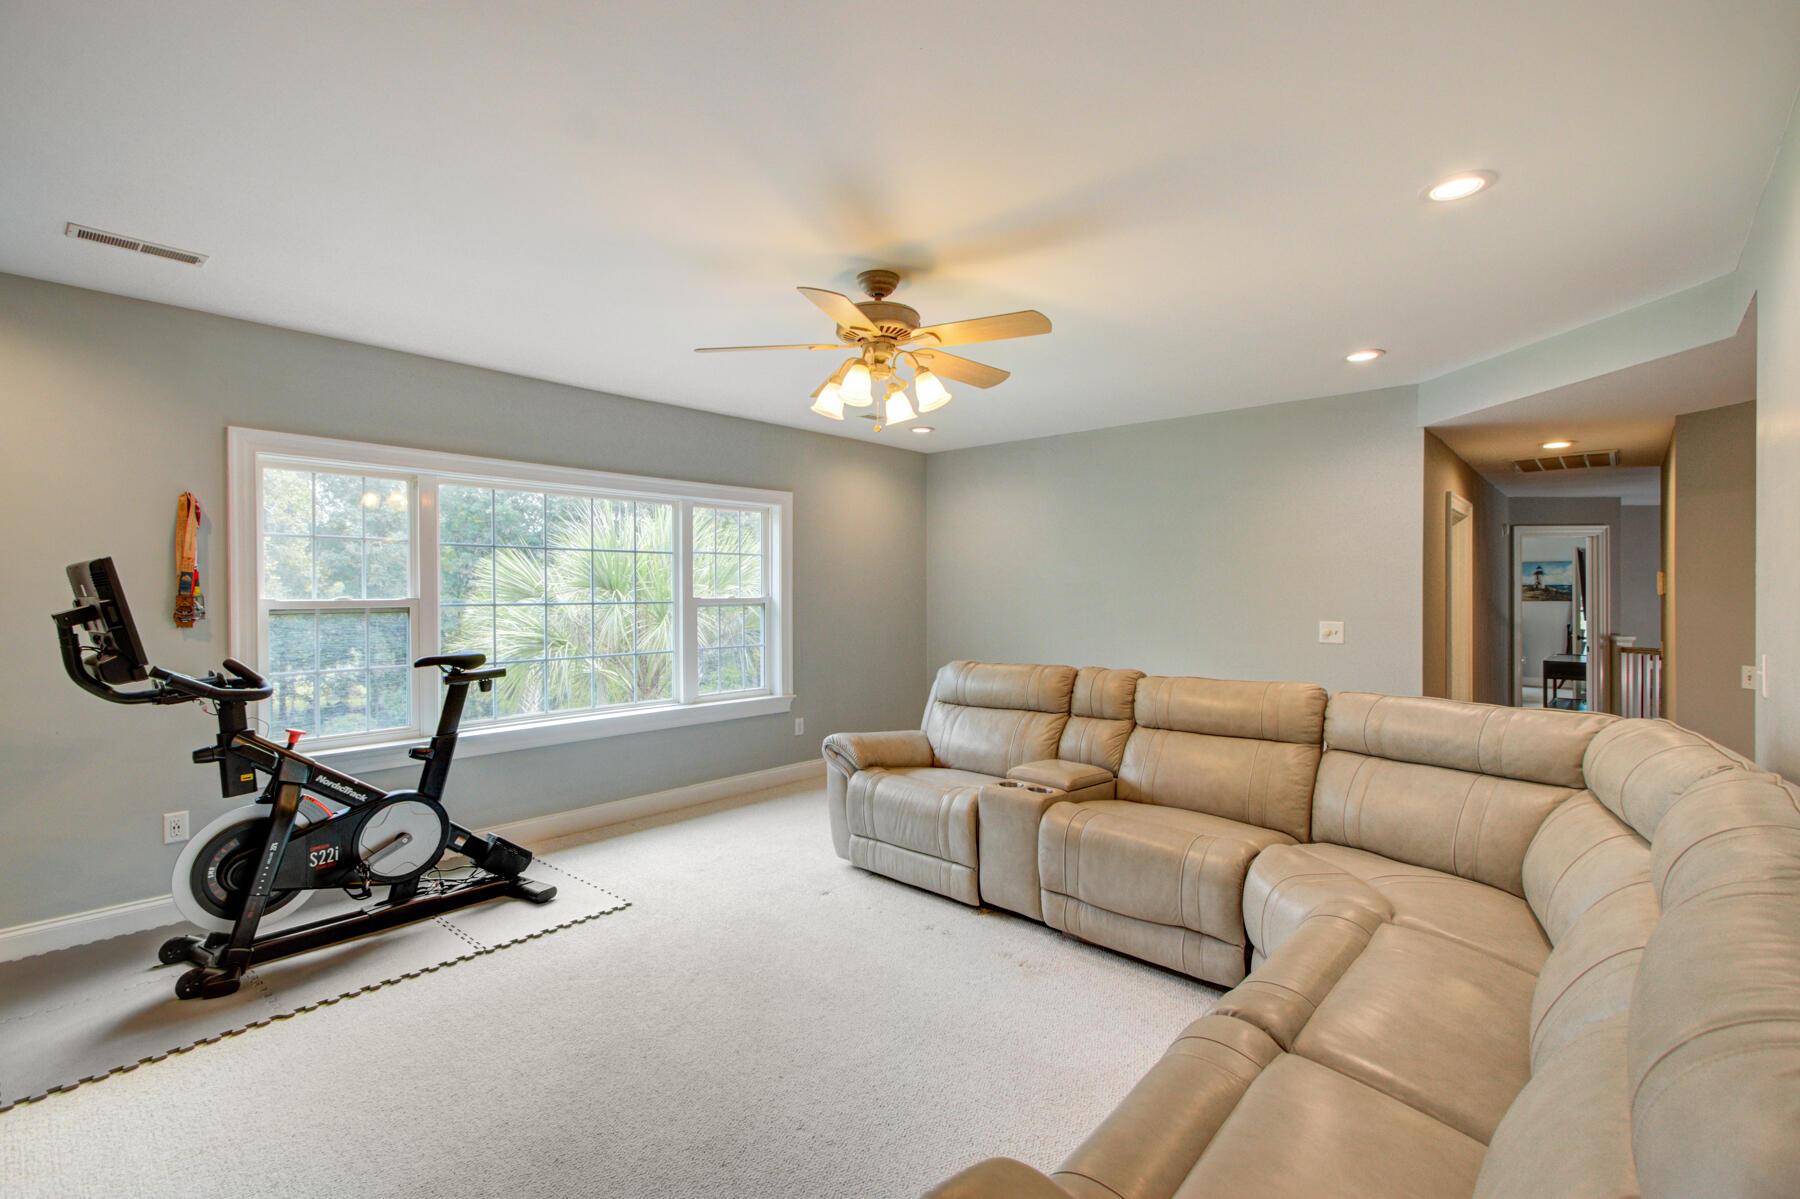 Dunes West Homes For Sale - 3095 Pignatelli, Mount Pleasant, SC - 21